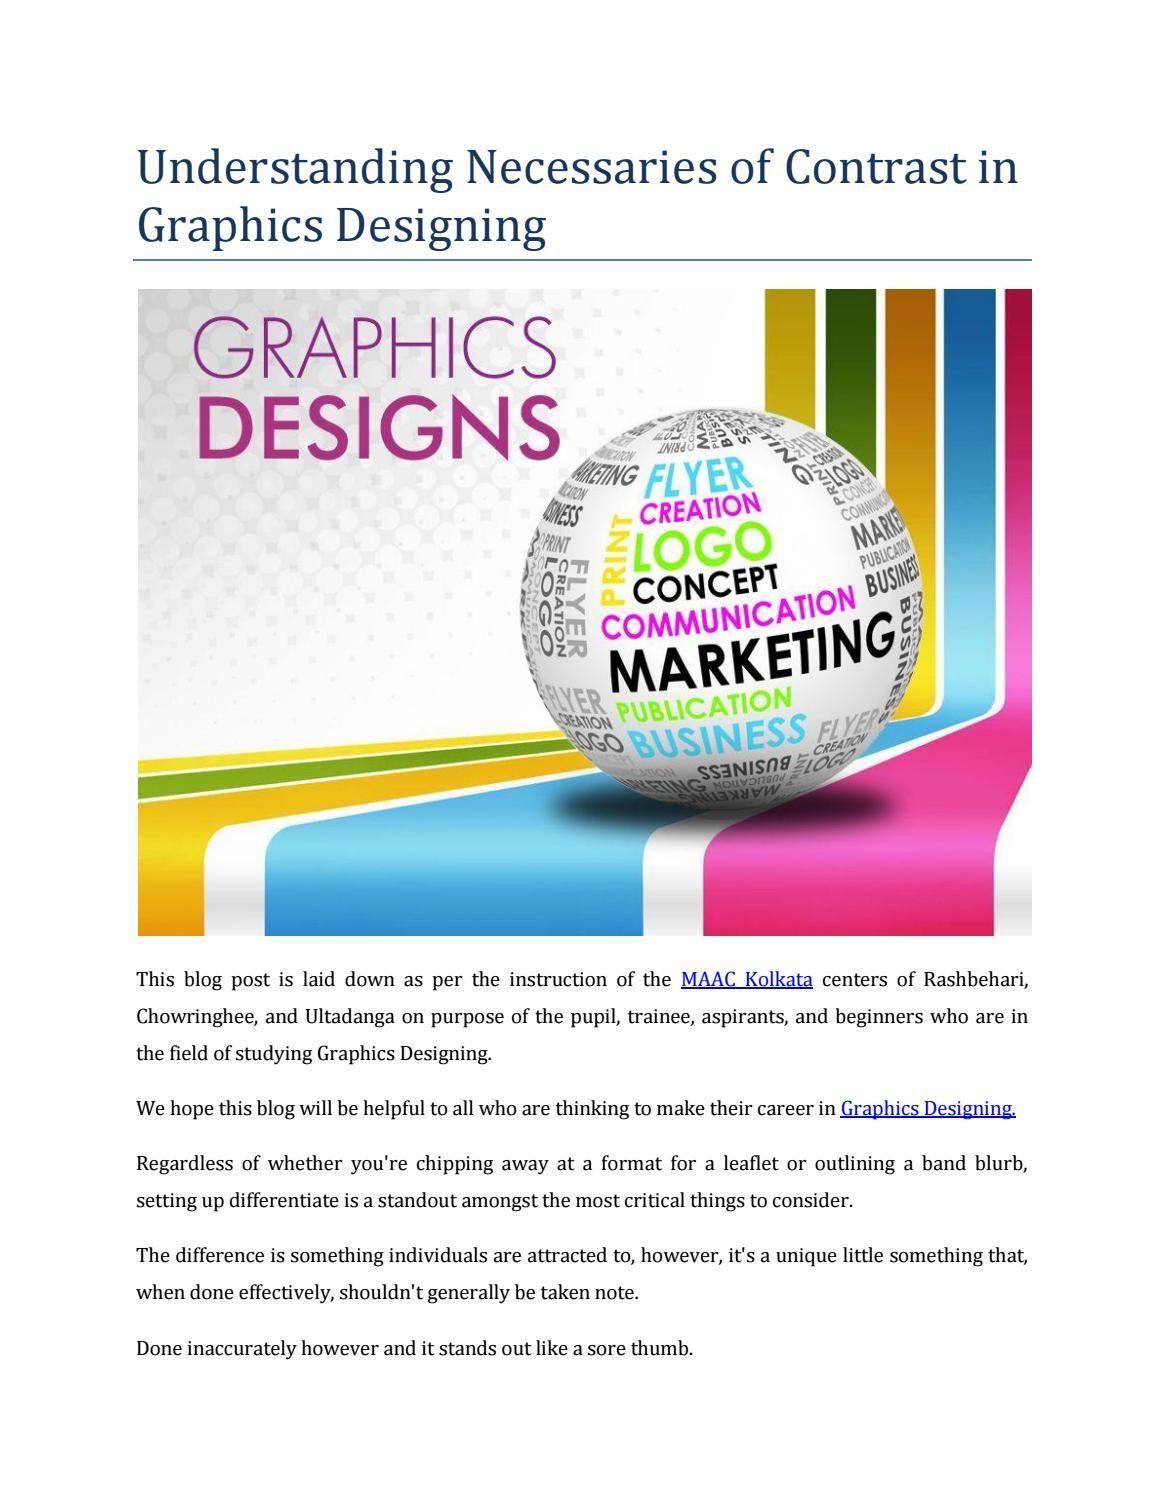 Understanding necessaries of contrast in graphics designing pdf also rh pinterest